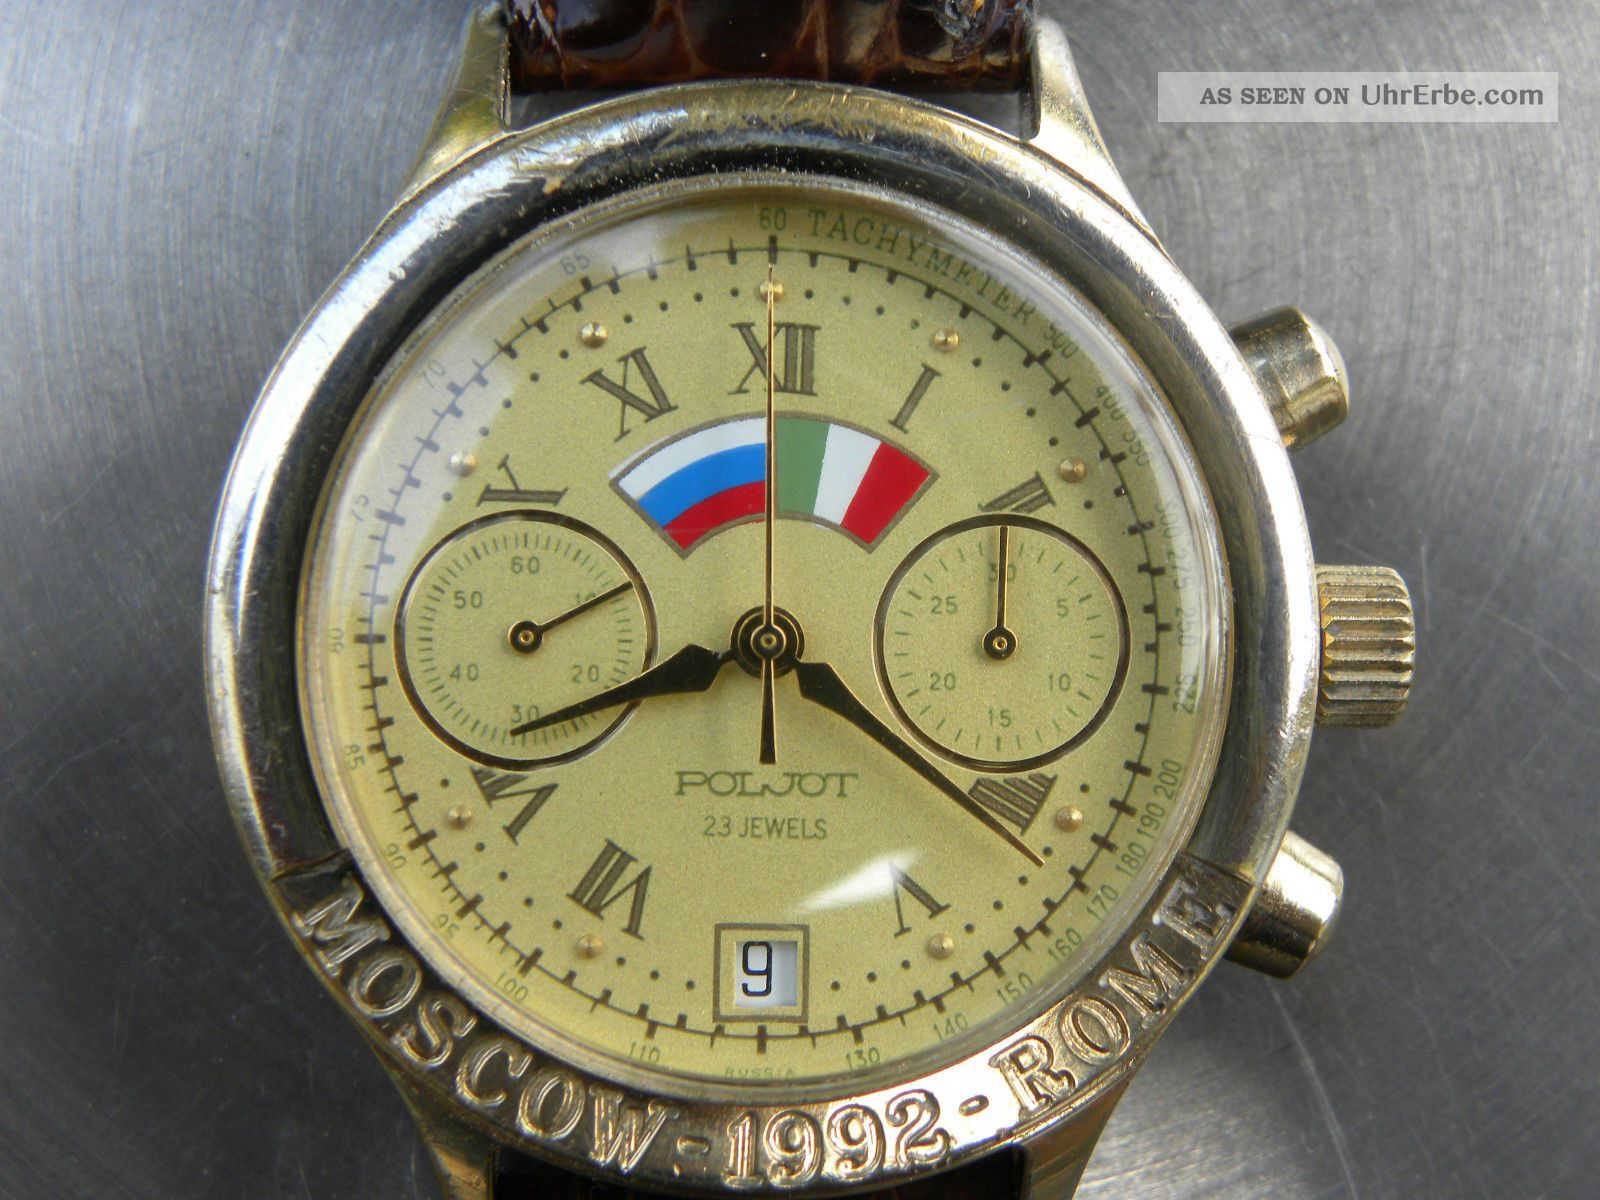 Poljot Mechanischer Chronograph Armbanduhren Bild